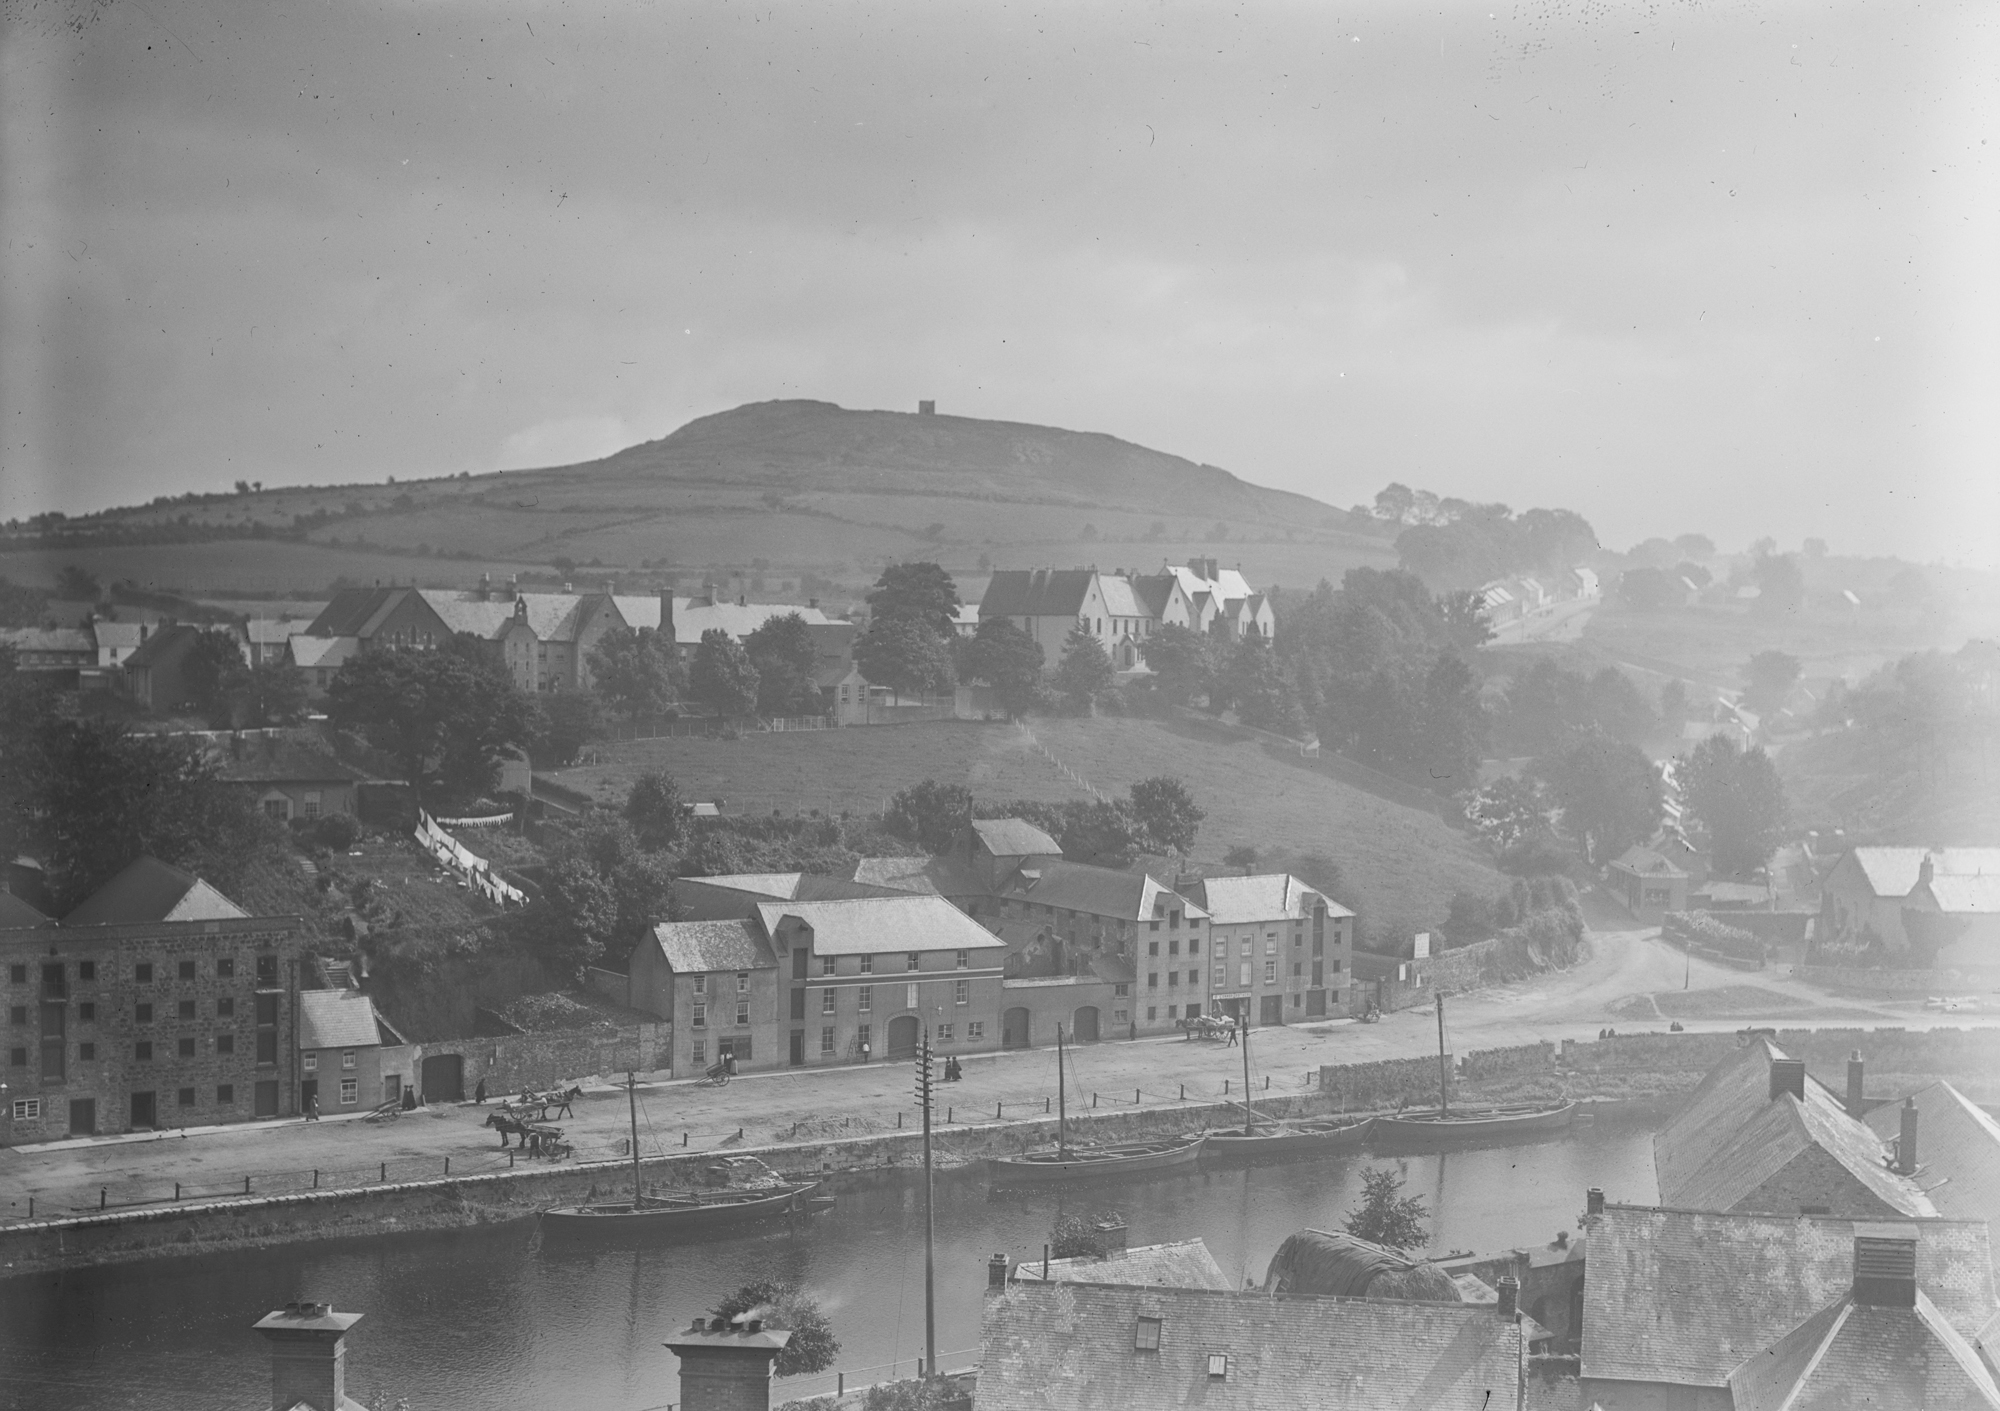 General View, Enniscorthy, Co. Wexford